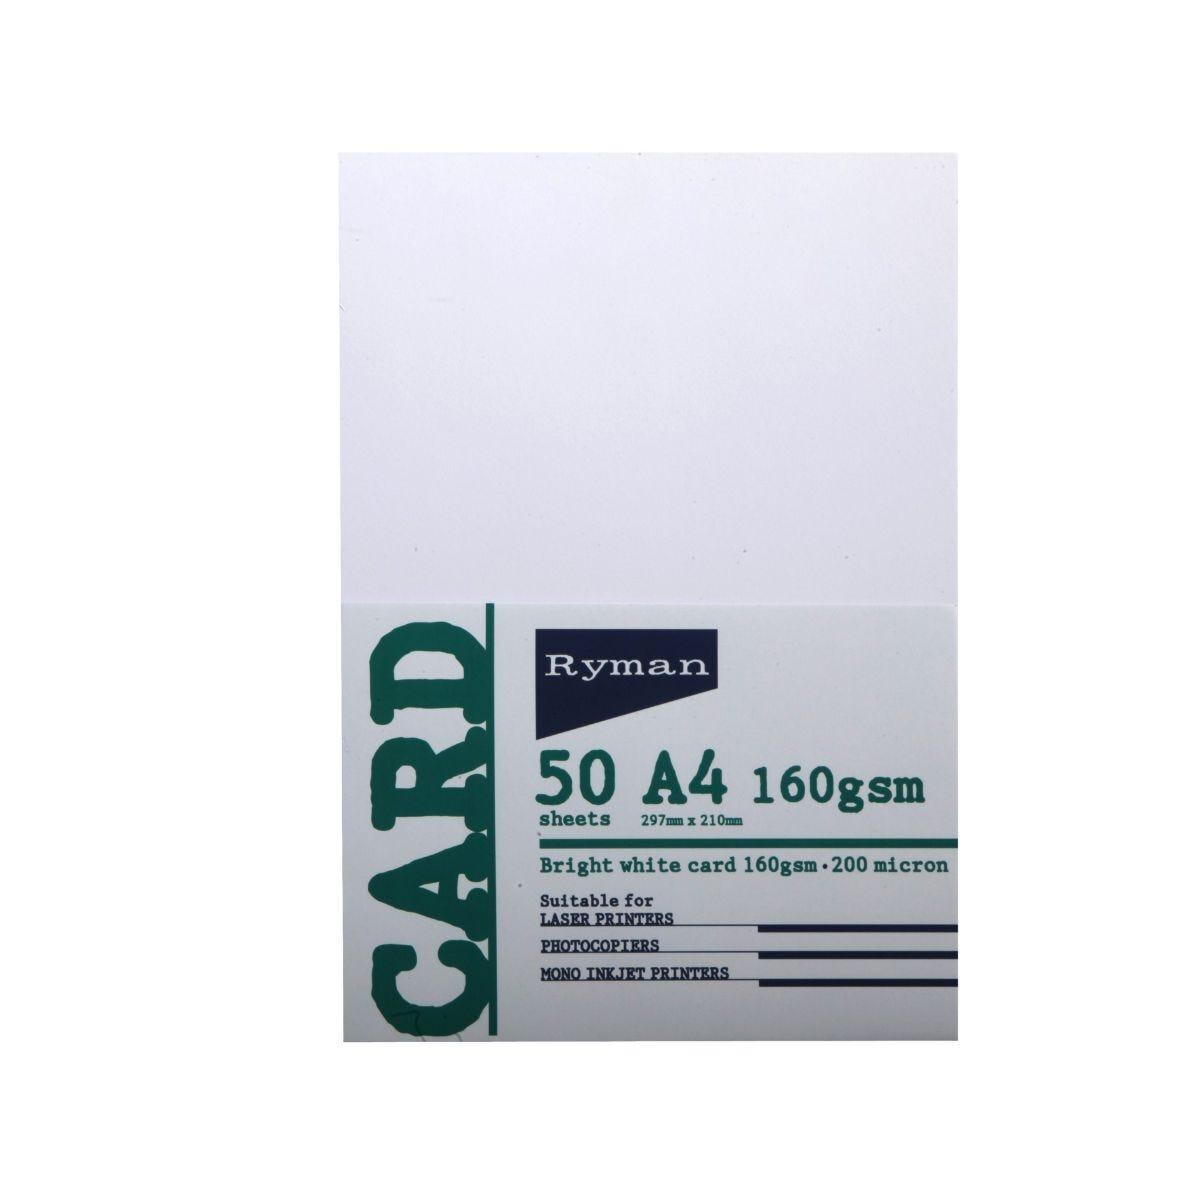 Ryman Card A4 160gsm 50 Sheets White